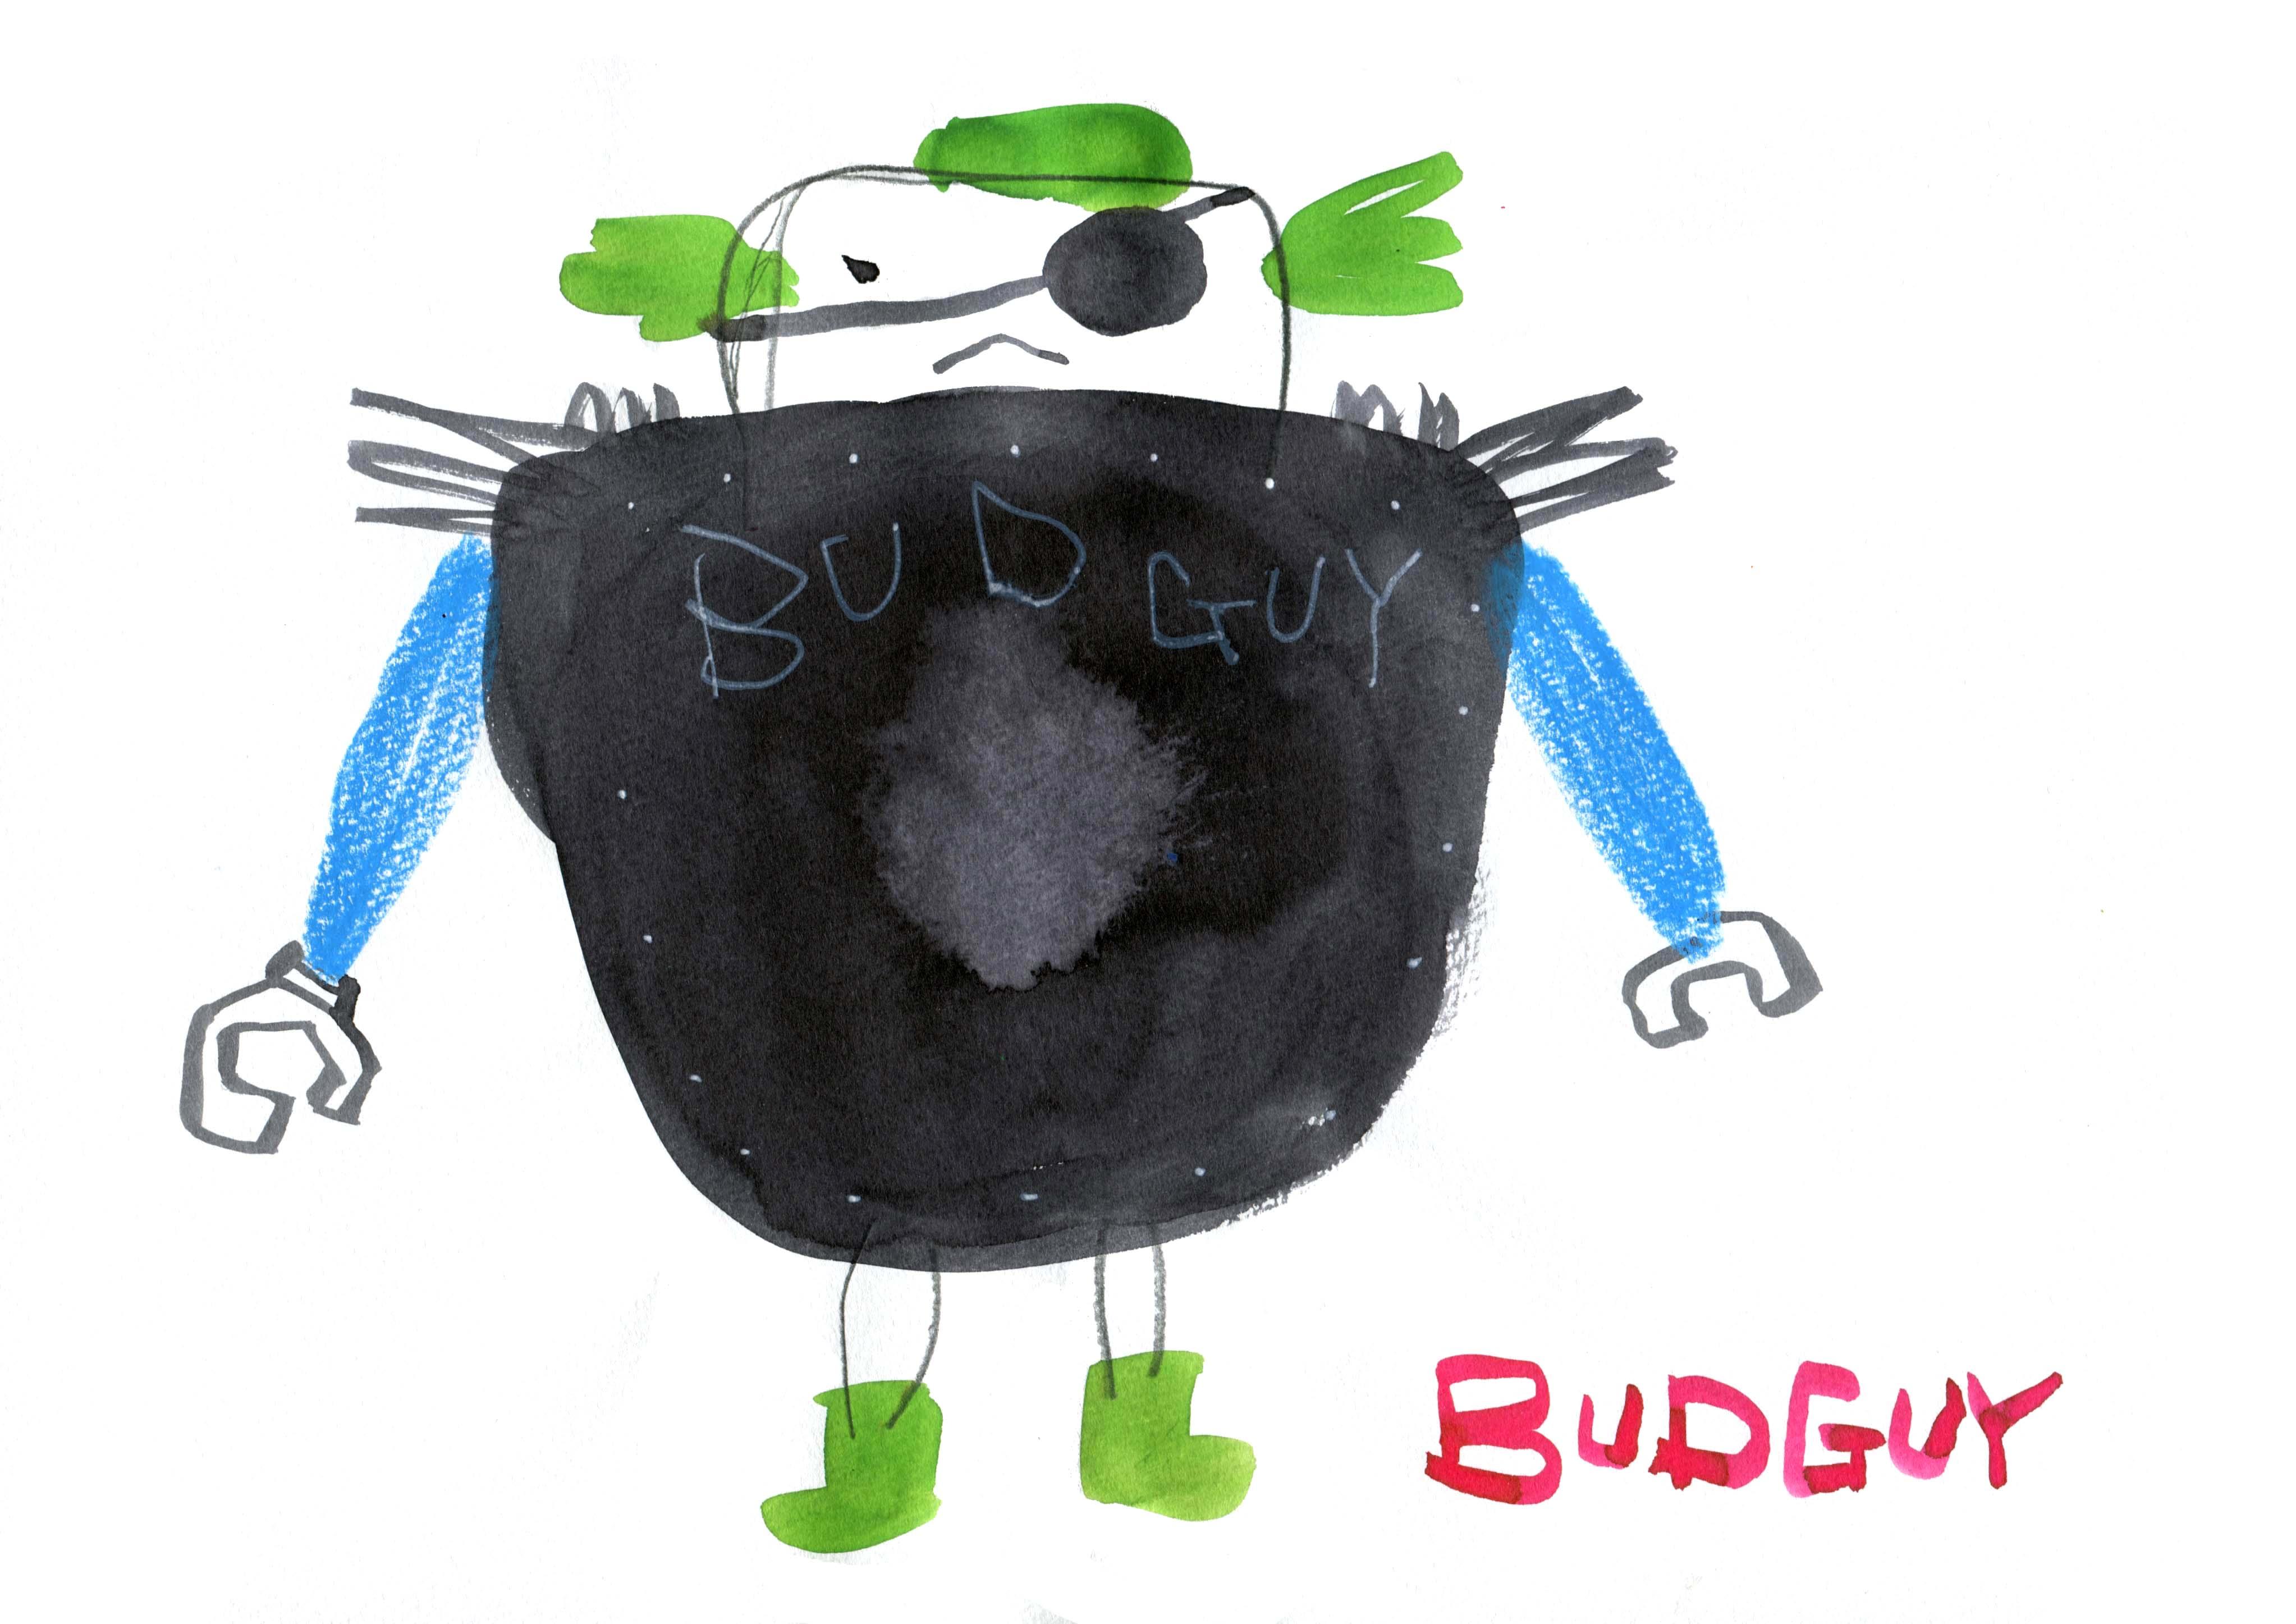 BUDGUY